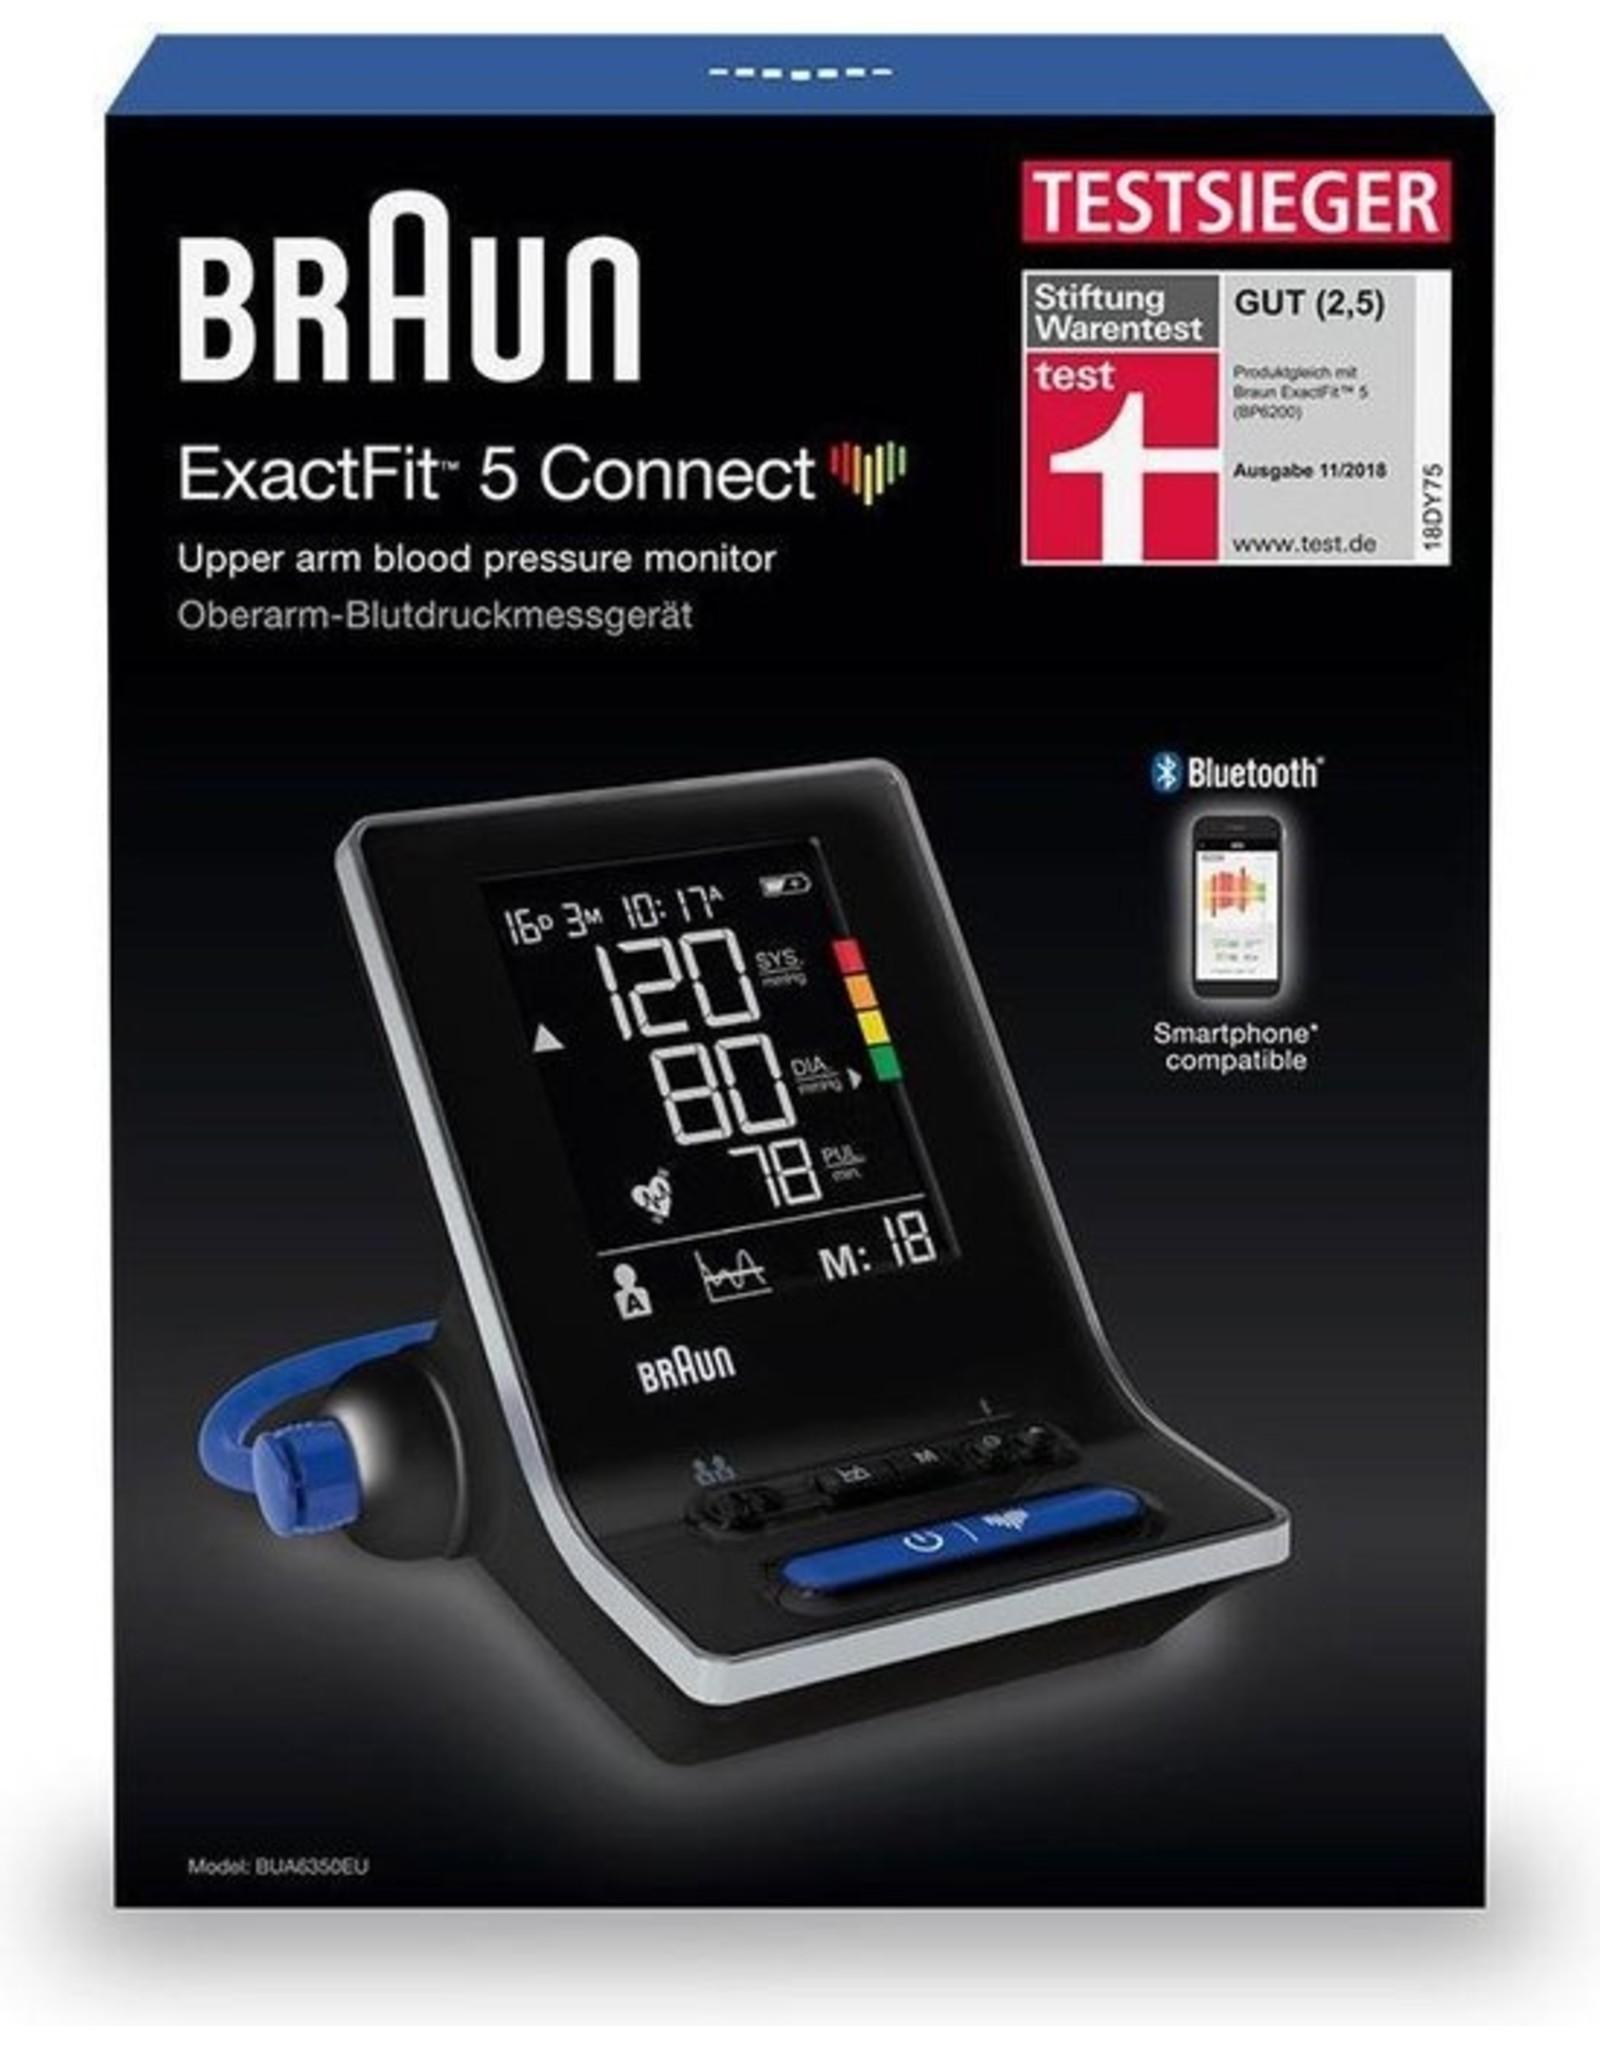 BRAUN Braun ExactFit 5 Connect